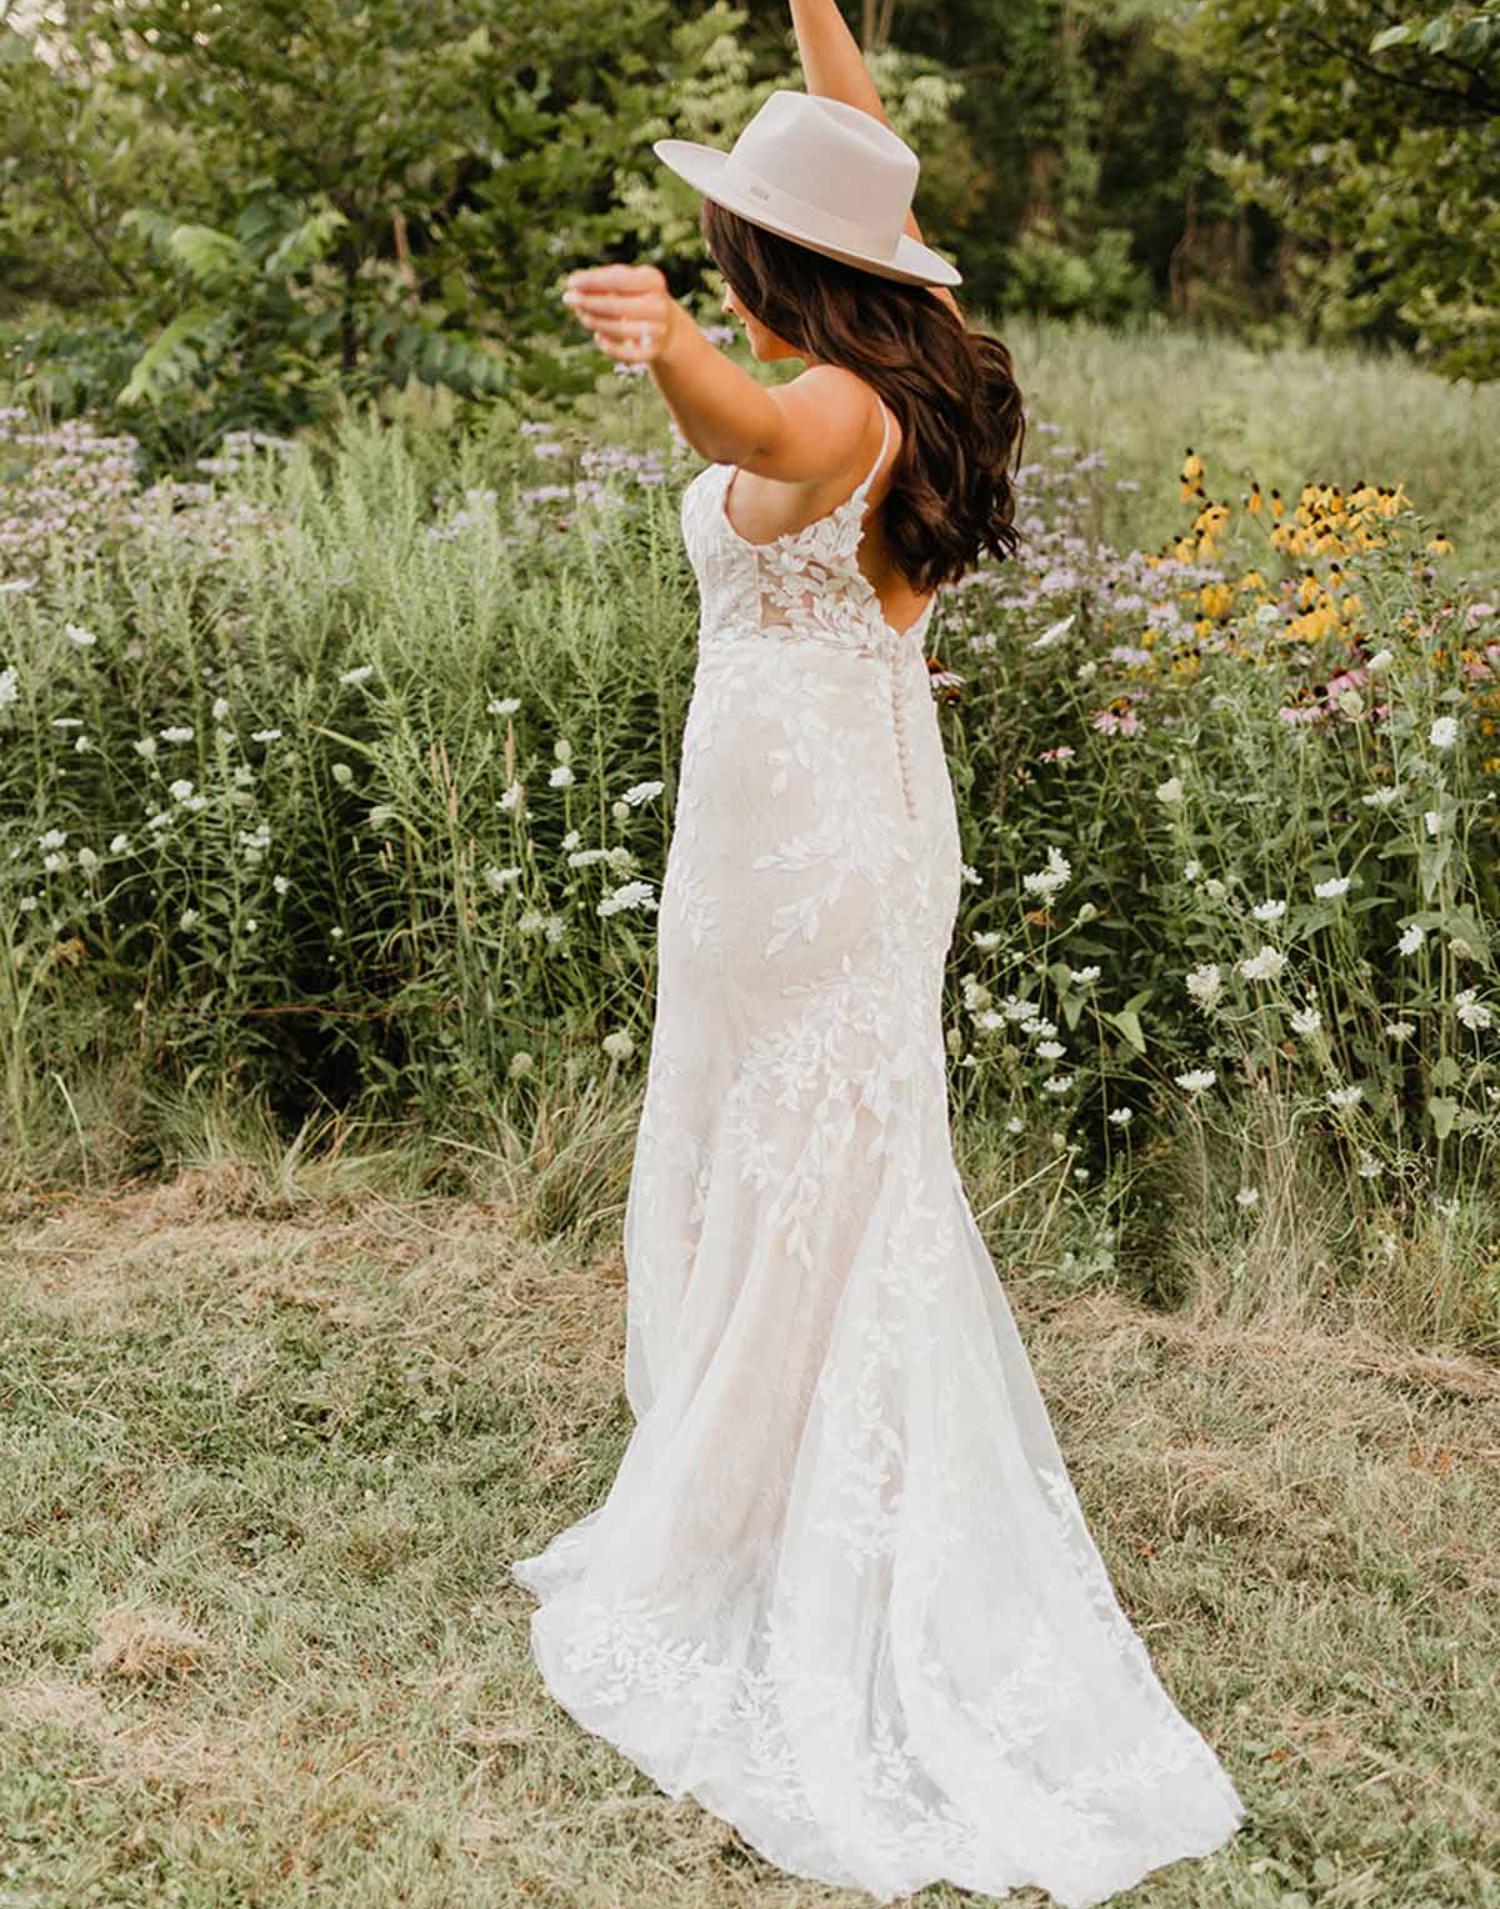 7132- Stella York Wedding Dress Collection – Front View